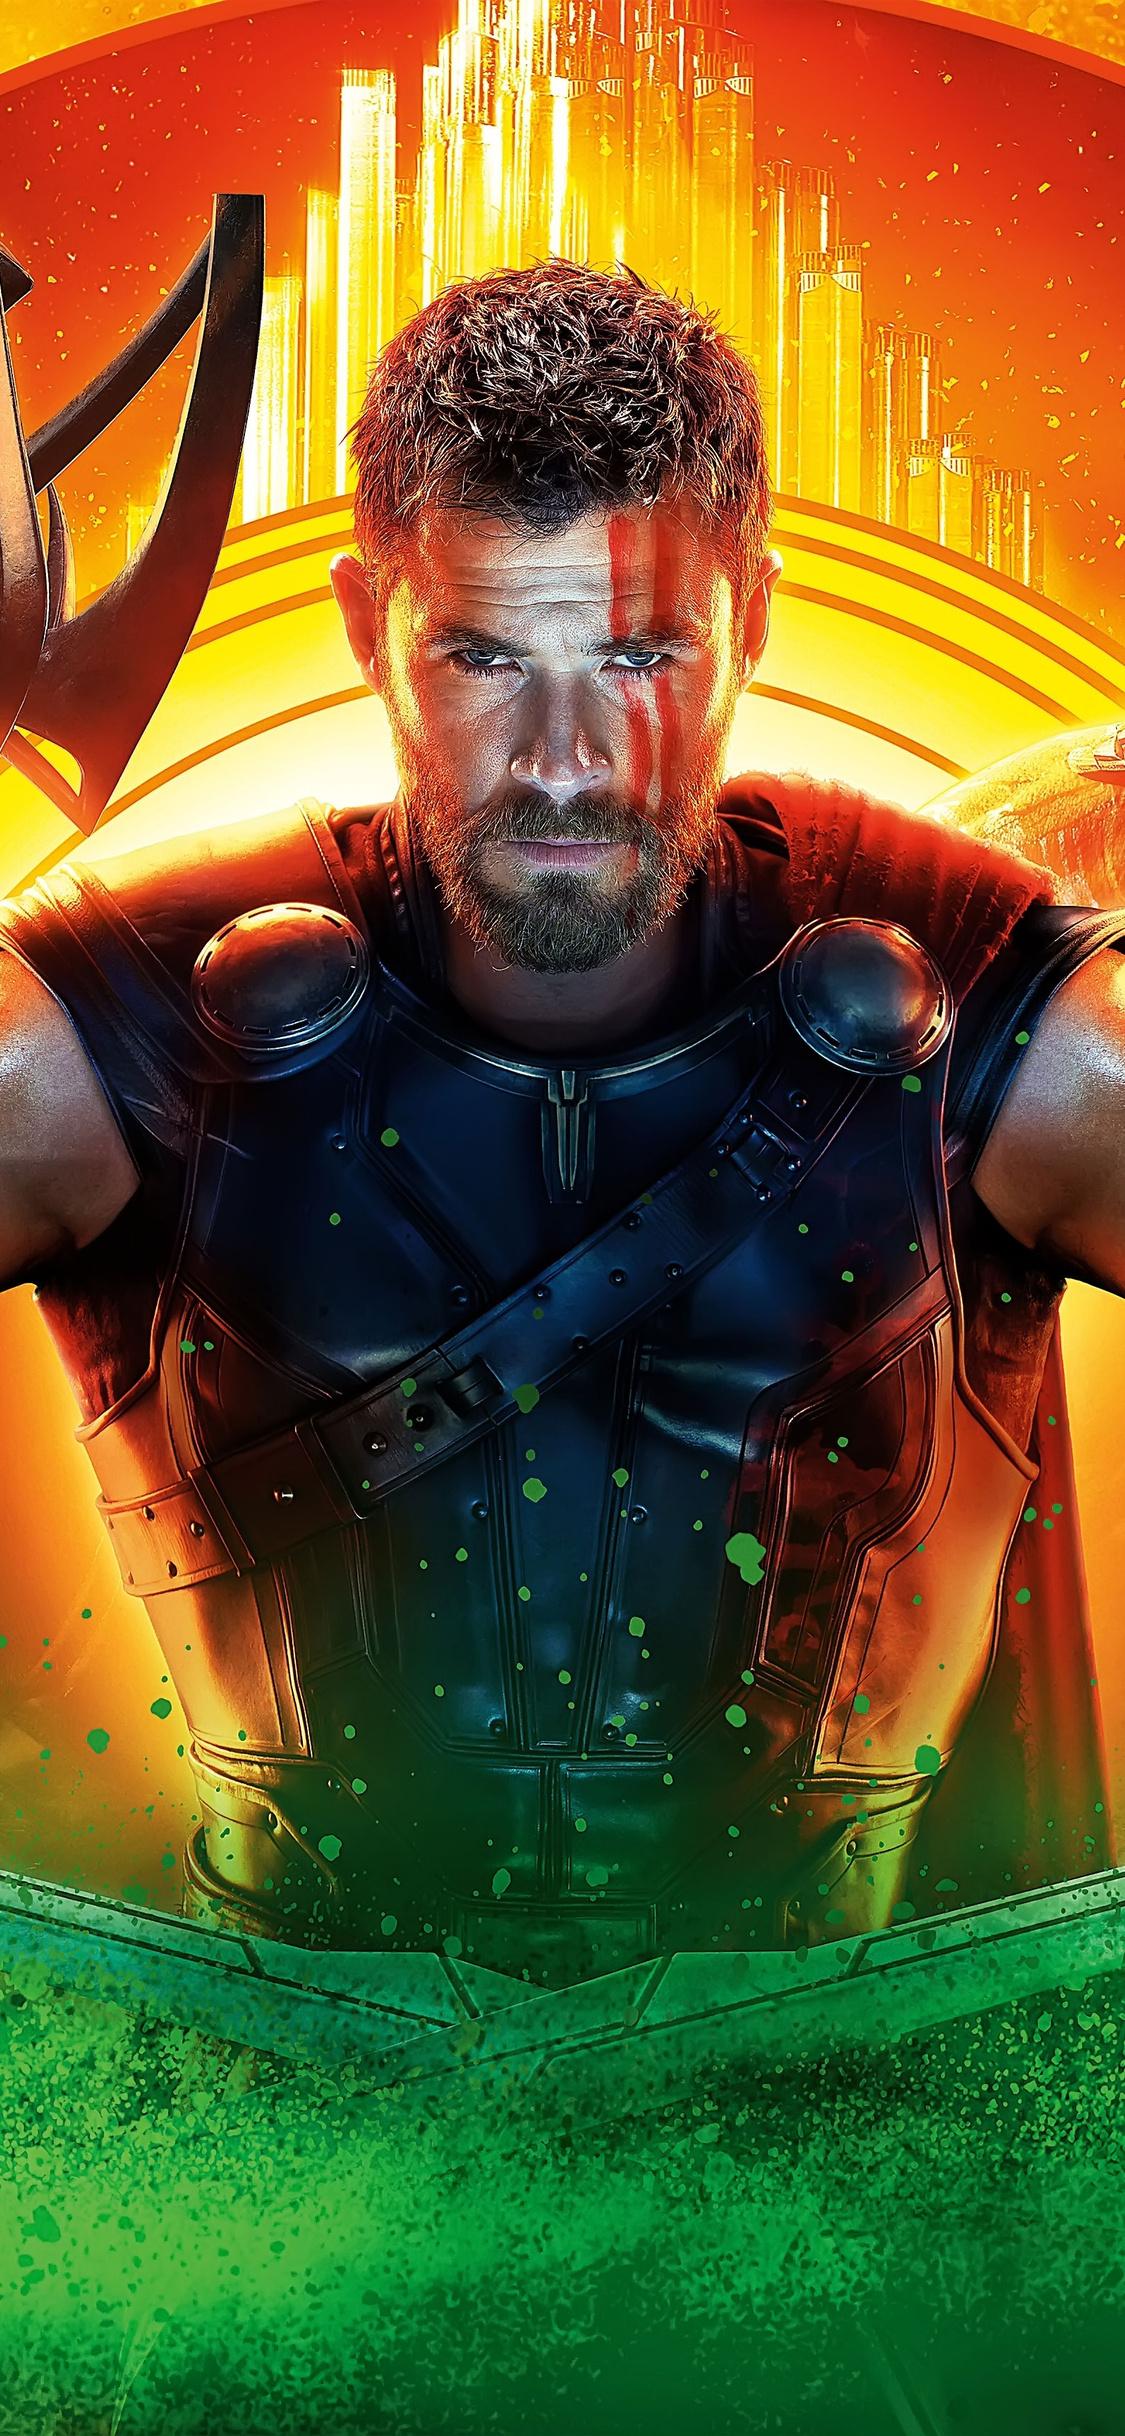 1125x2436 thor ragnarok 2017 movie 8k iphone xs iphone 10 - Thor ragnarok wallpaper 4k ...